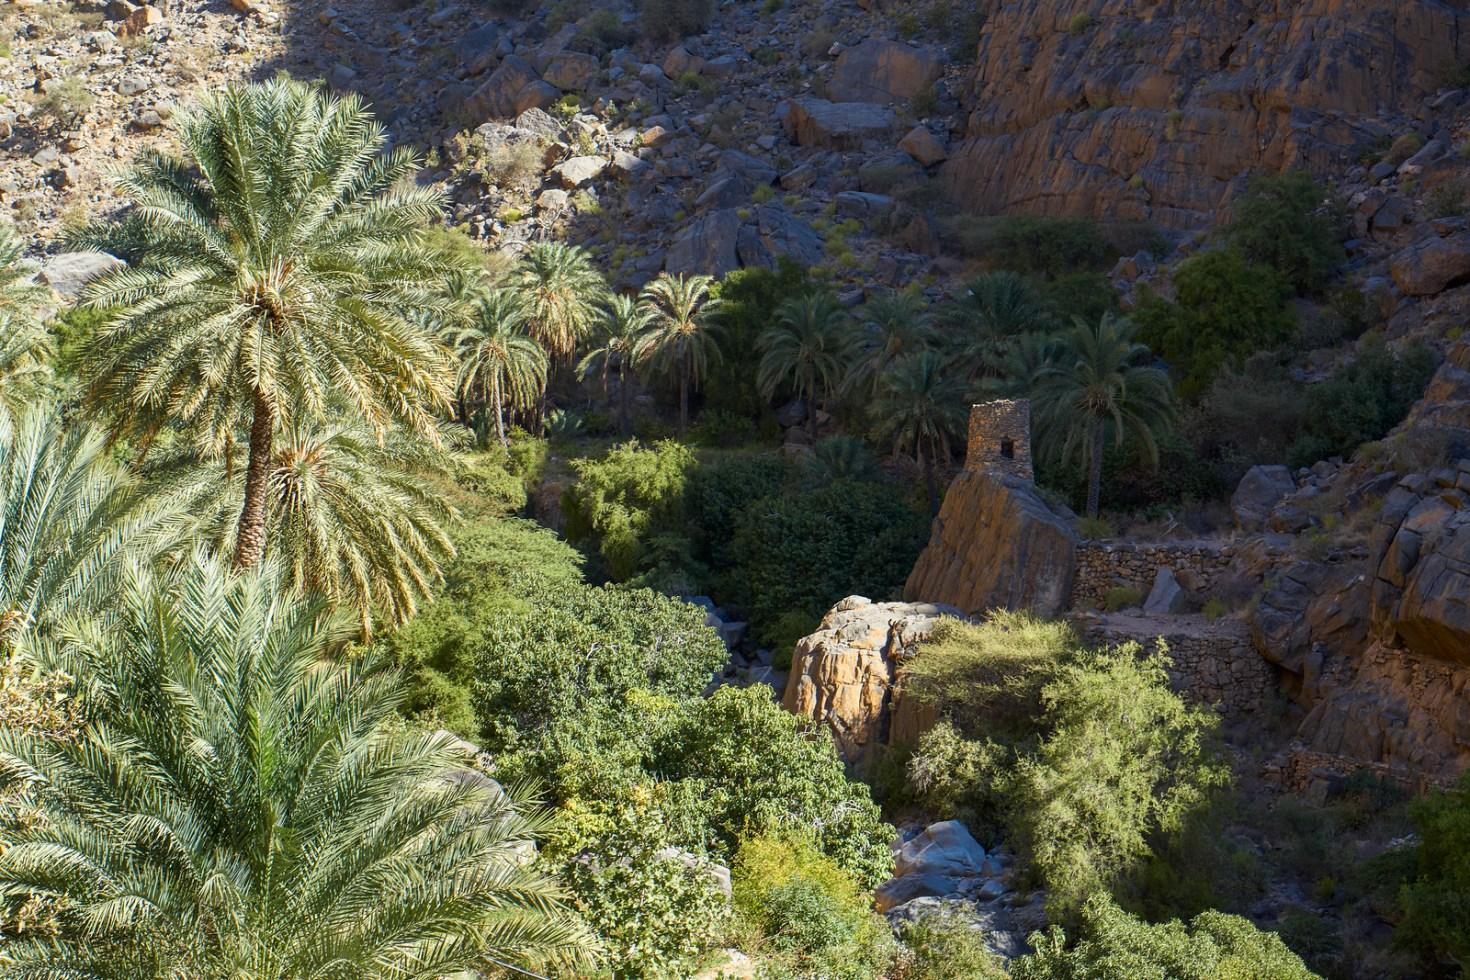 Watchtower in oasis